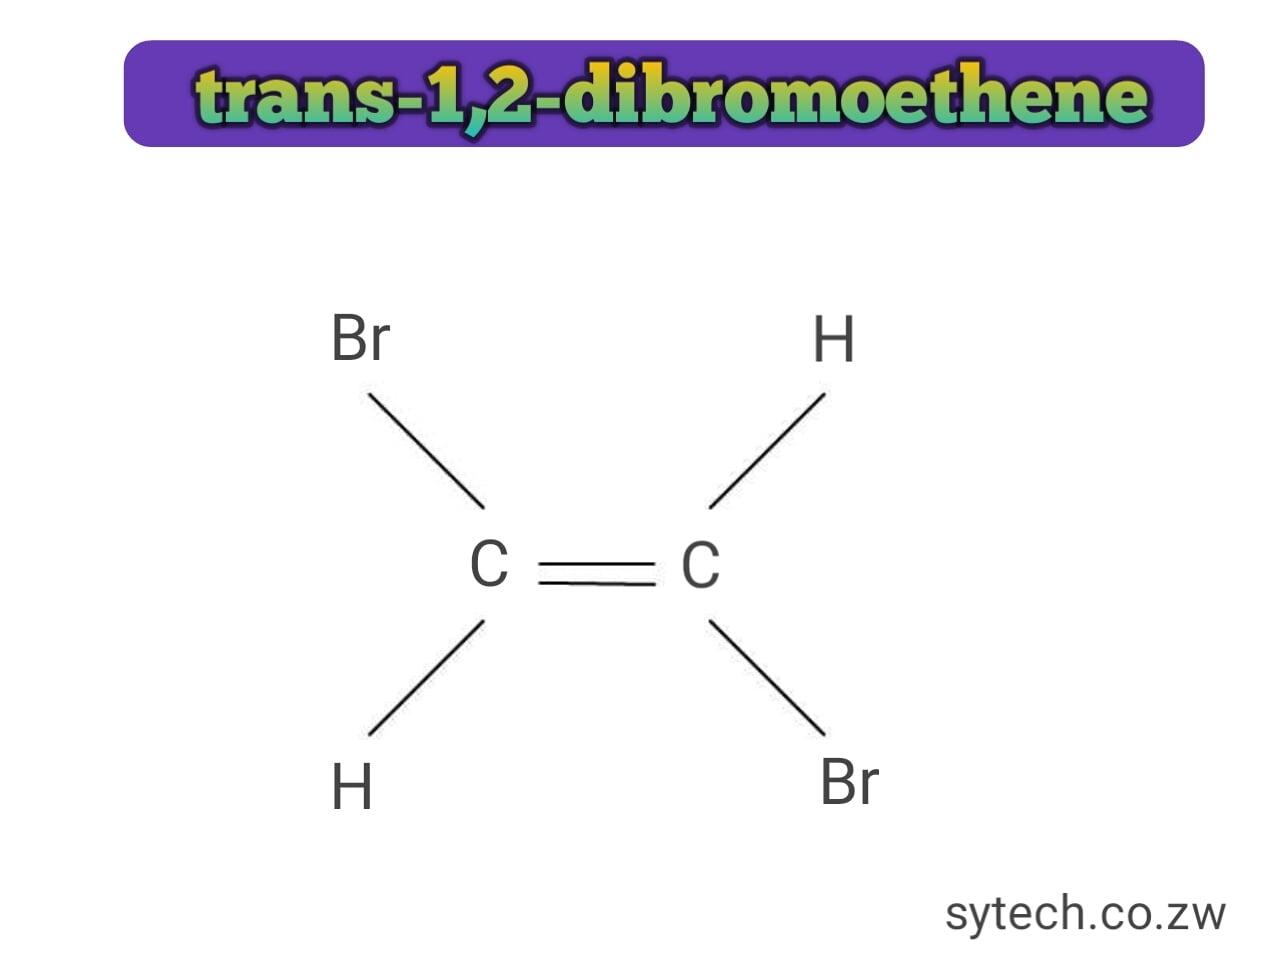 trans-1,2-dibromoethene